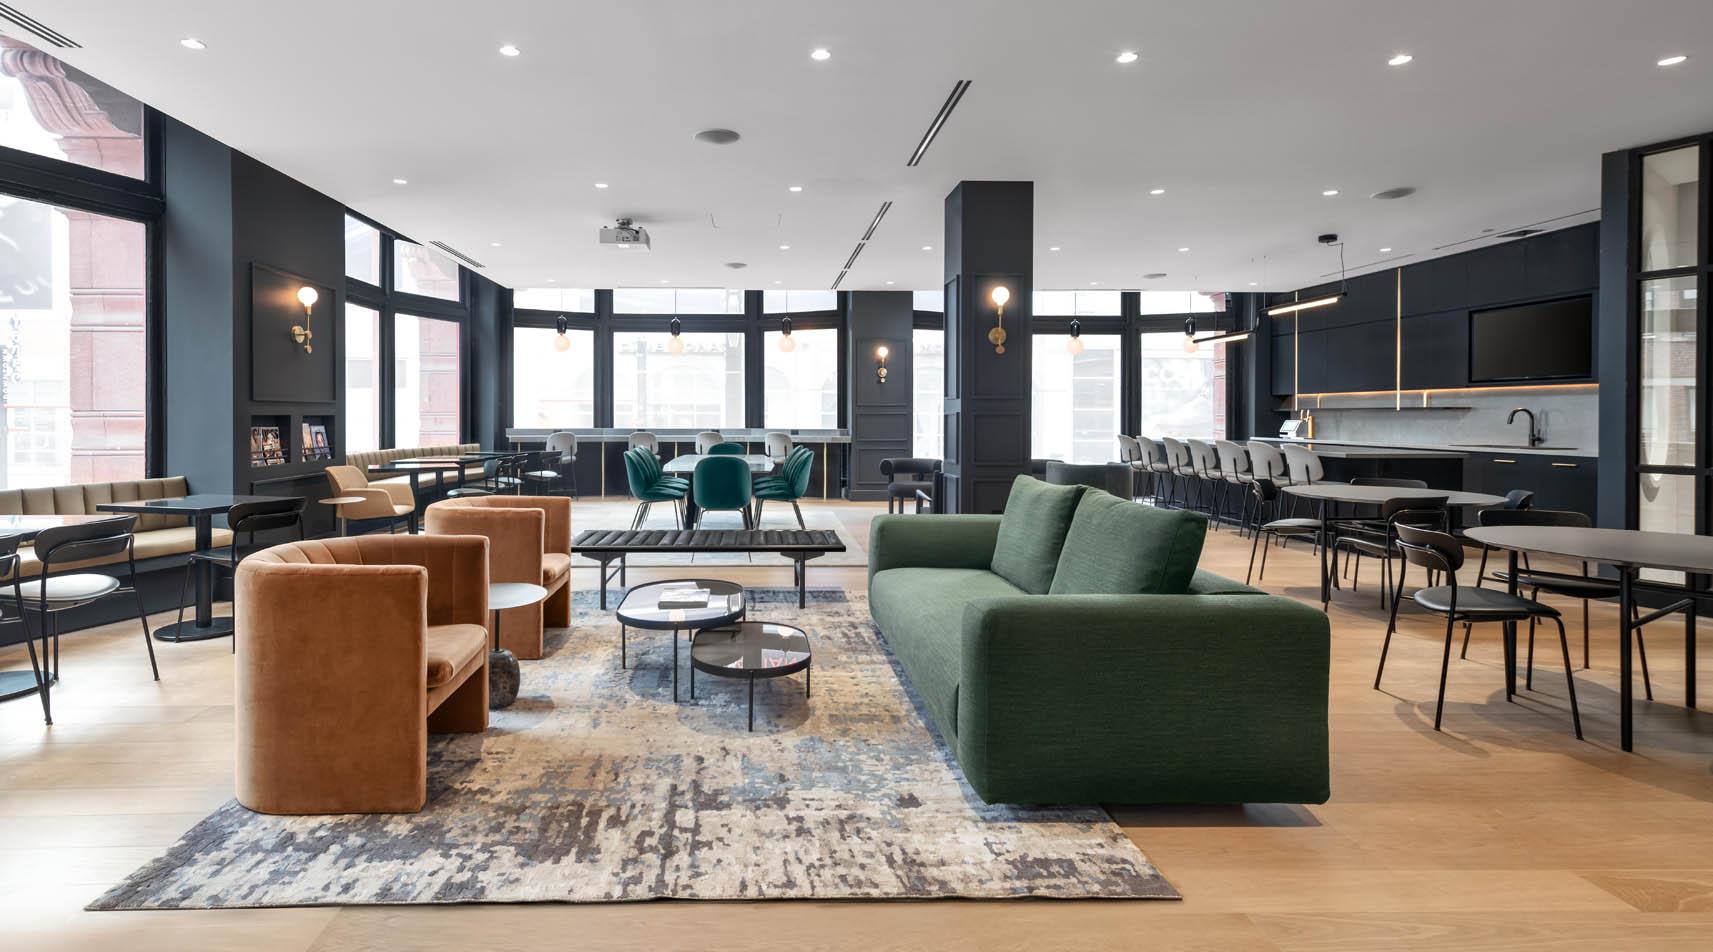 Image of the Tonic House lounge